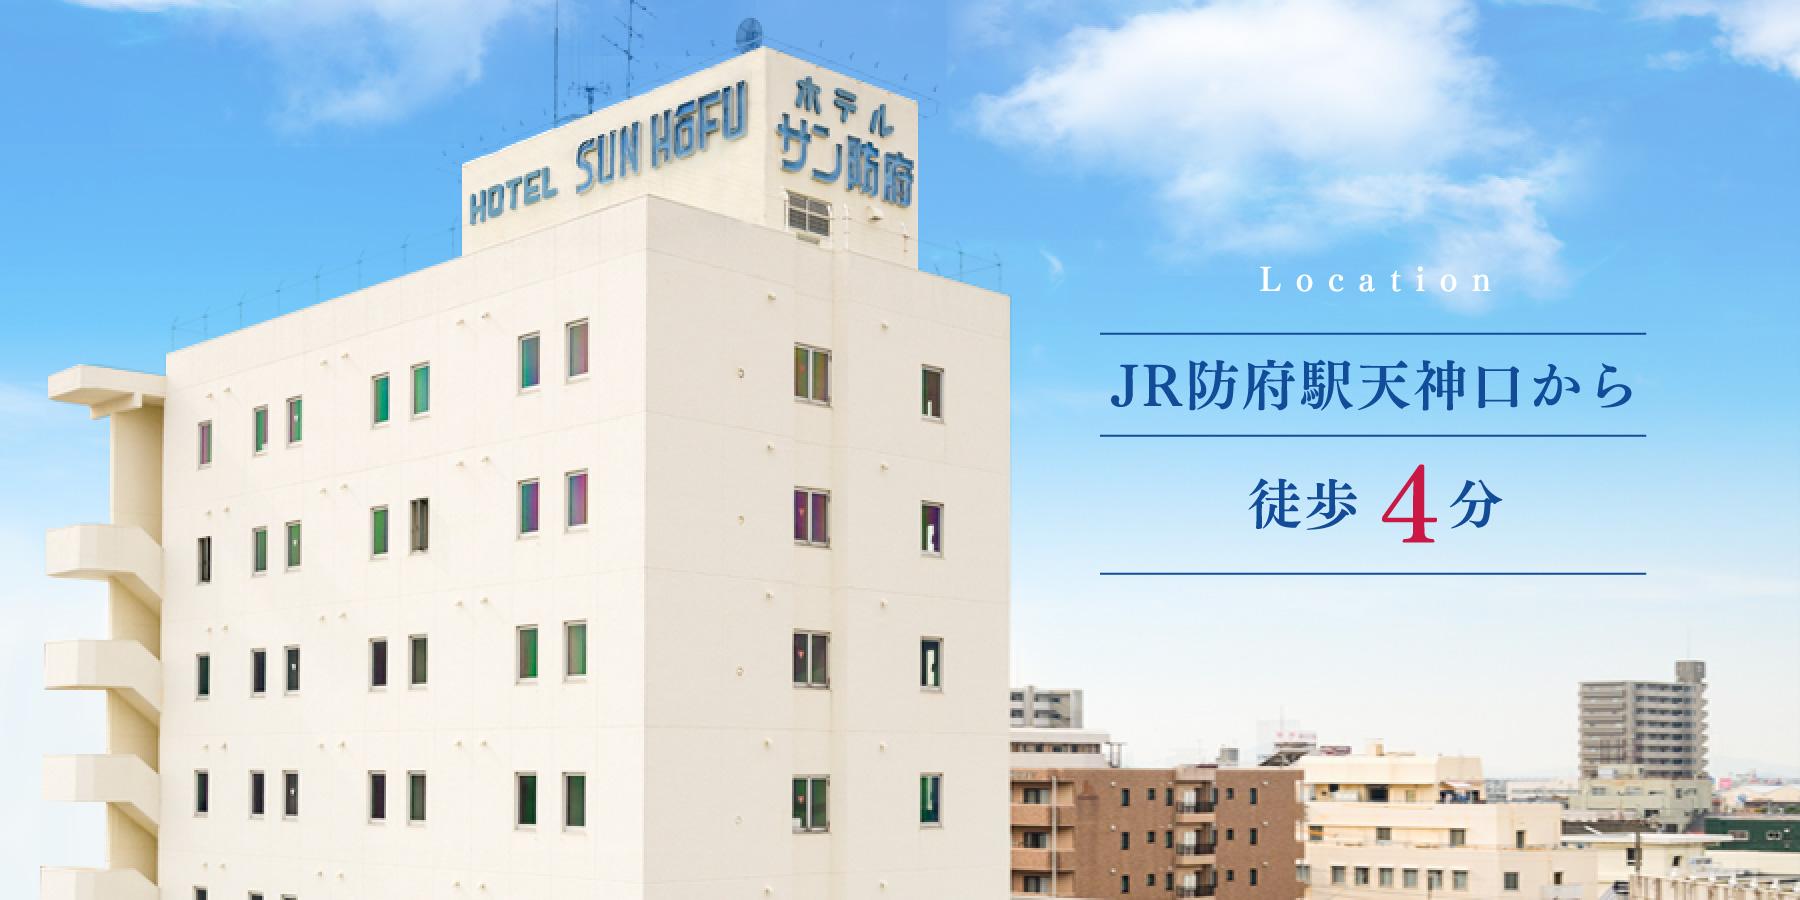 JR防府駅天神口から徒歩4分